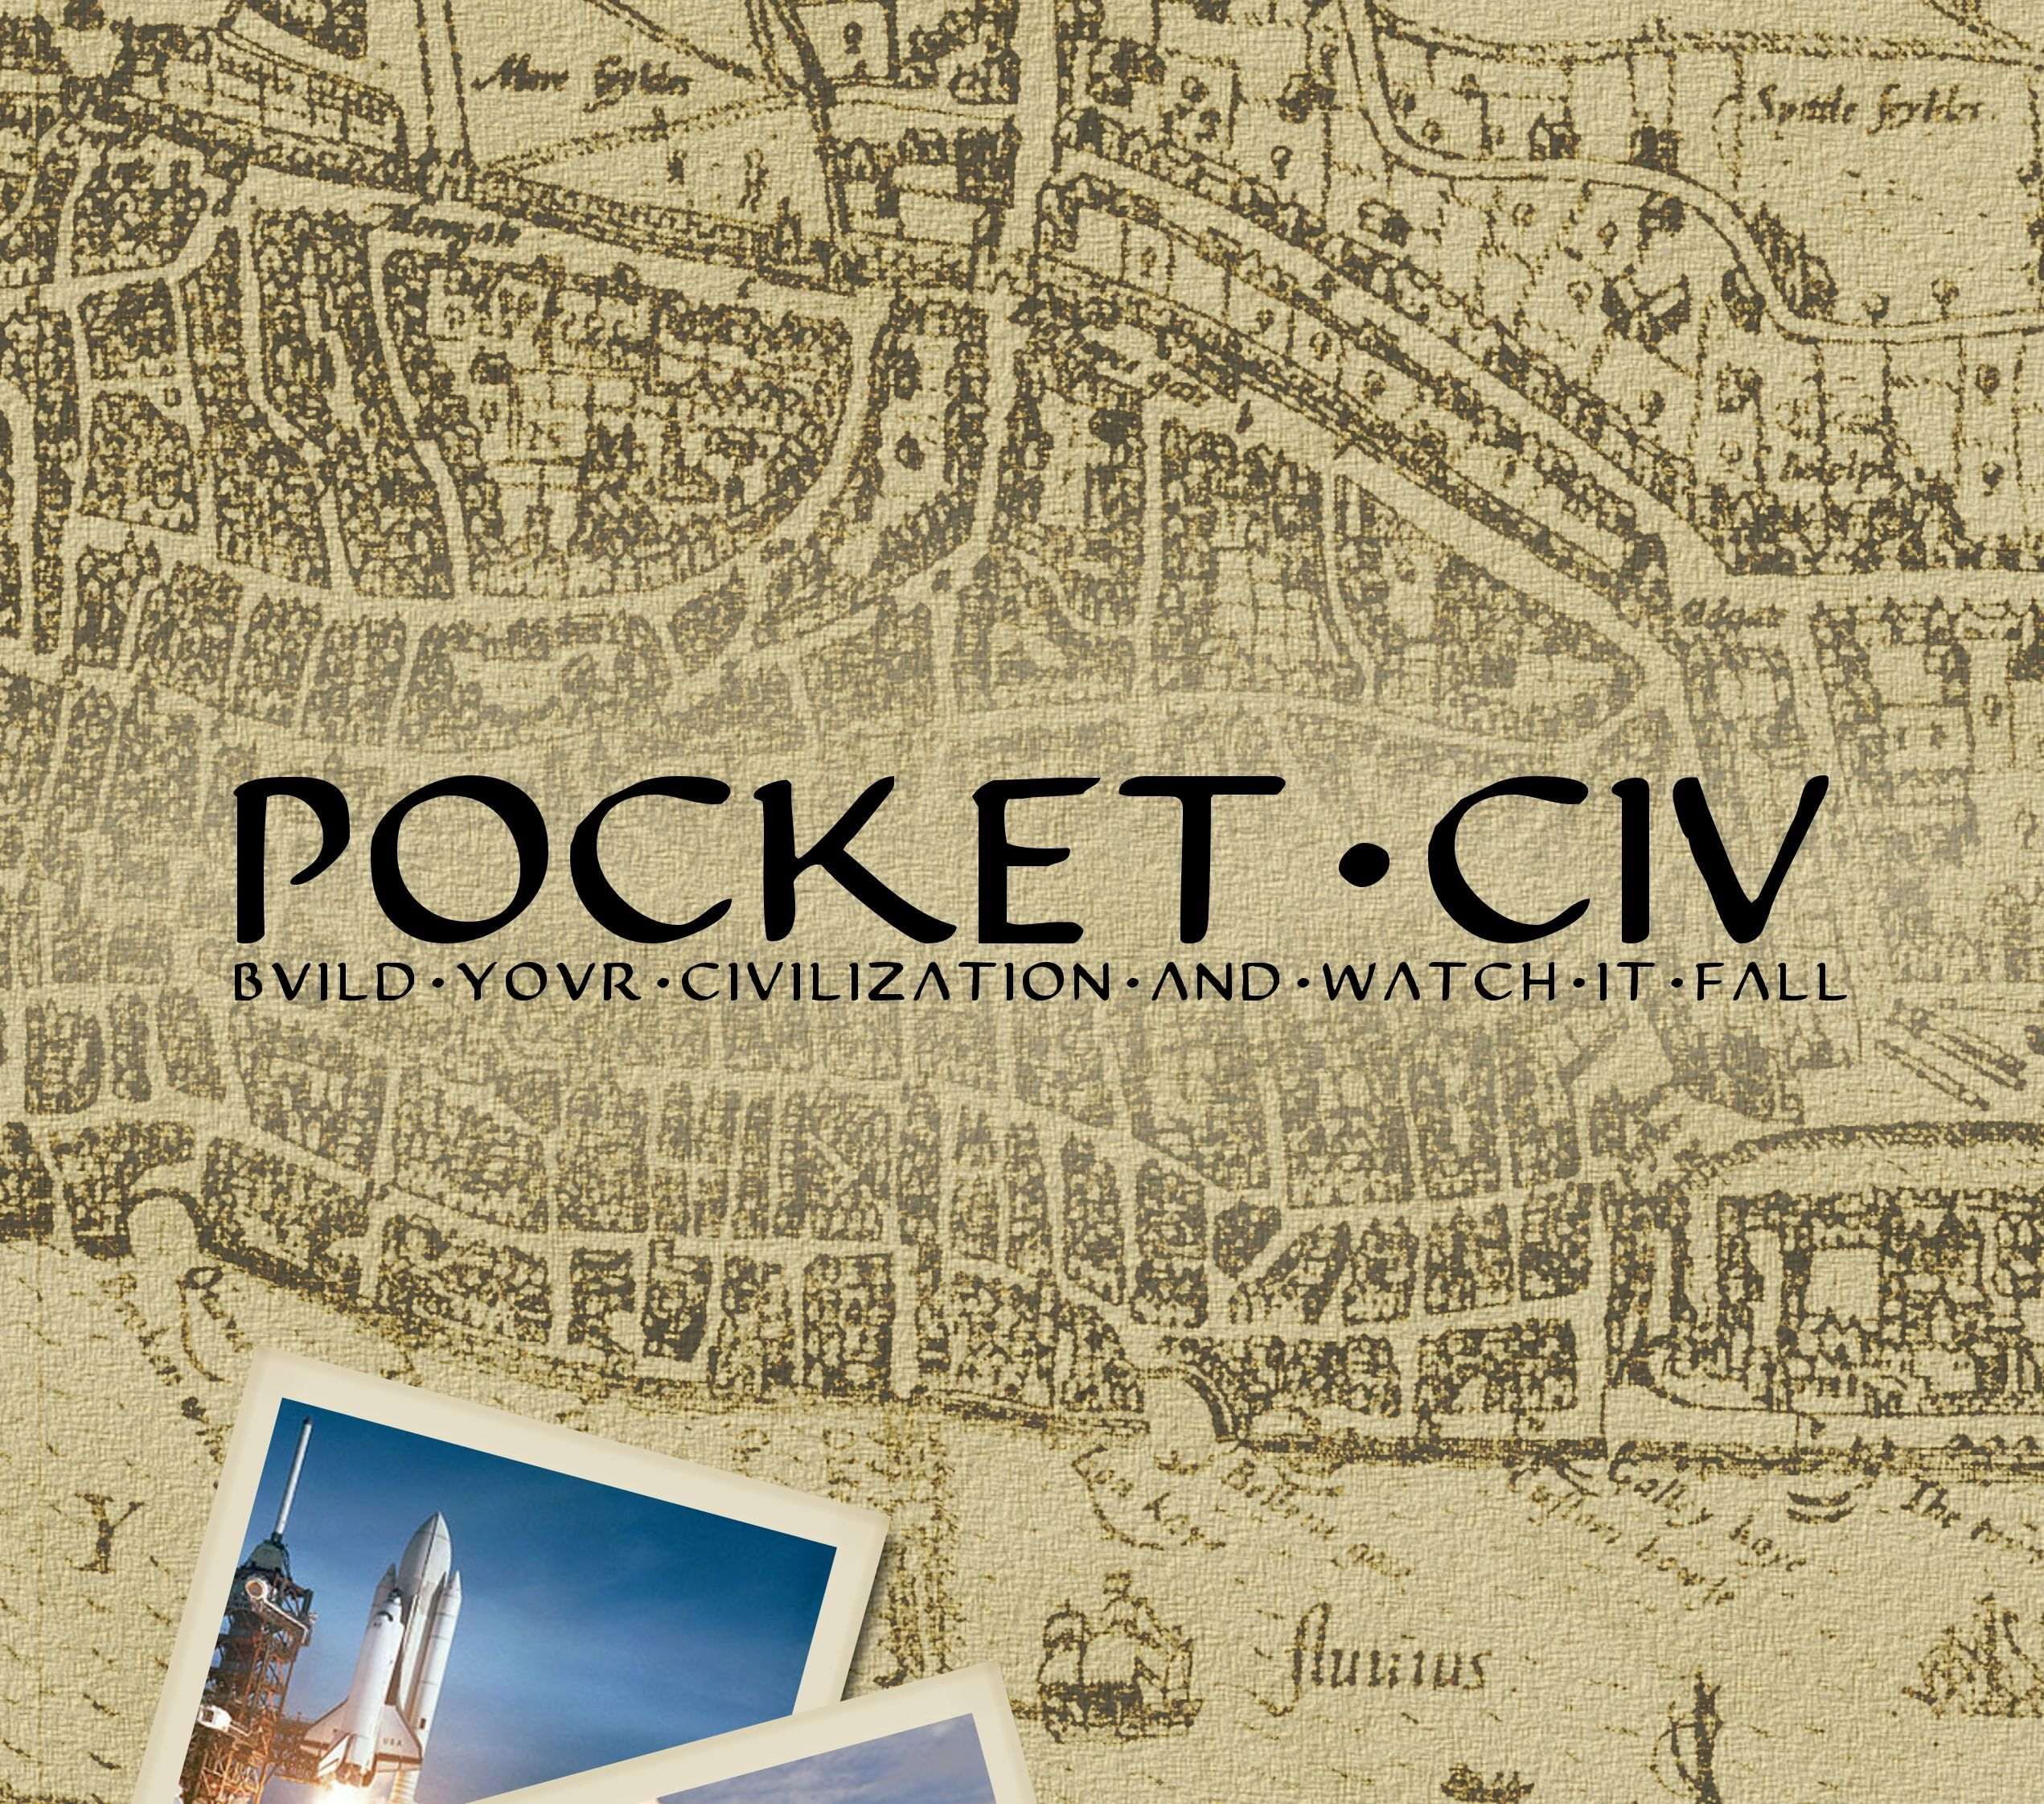 Pocket Civ